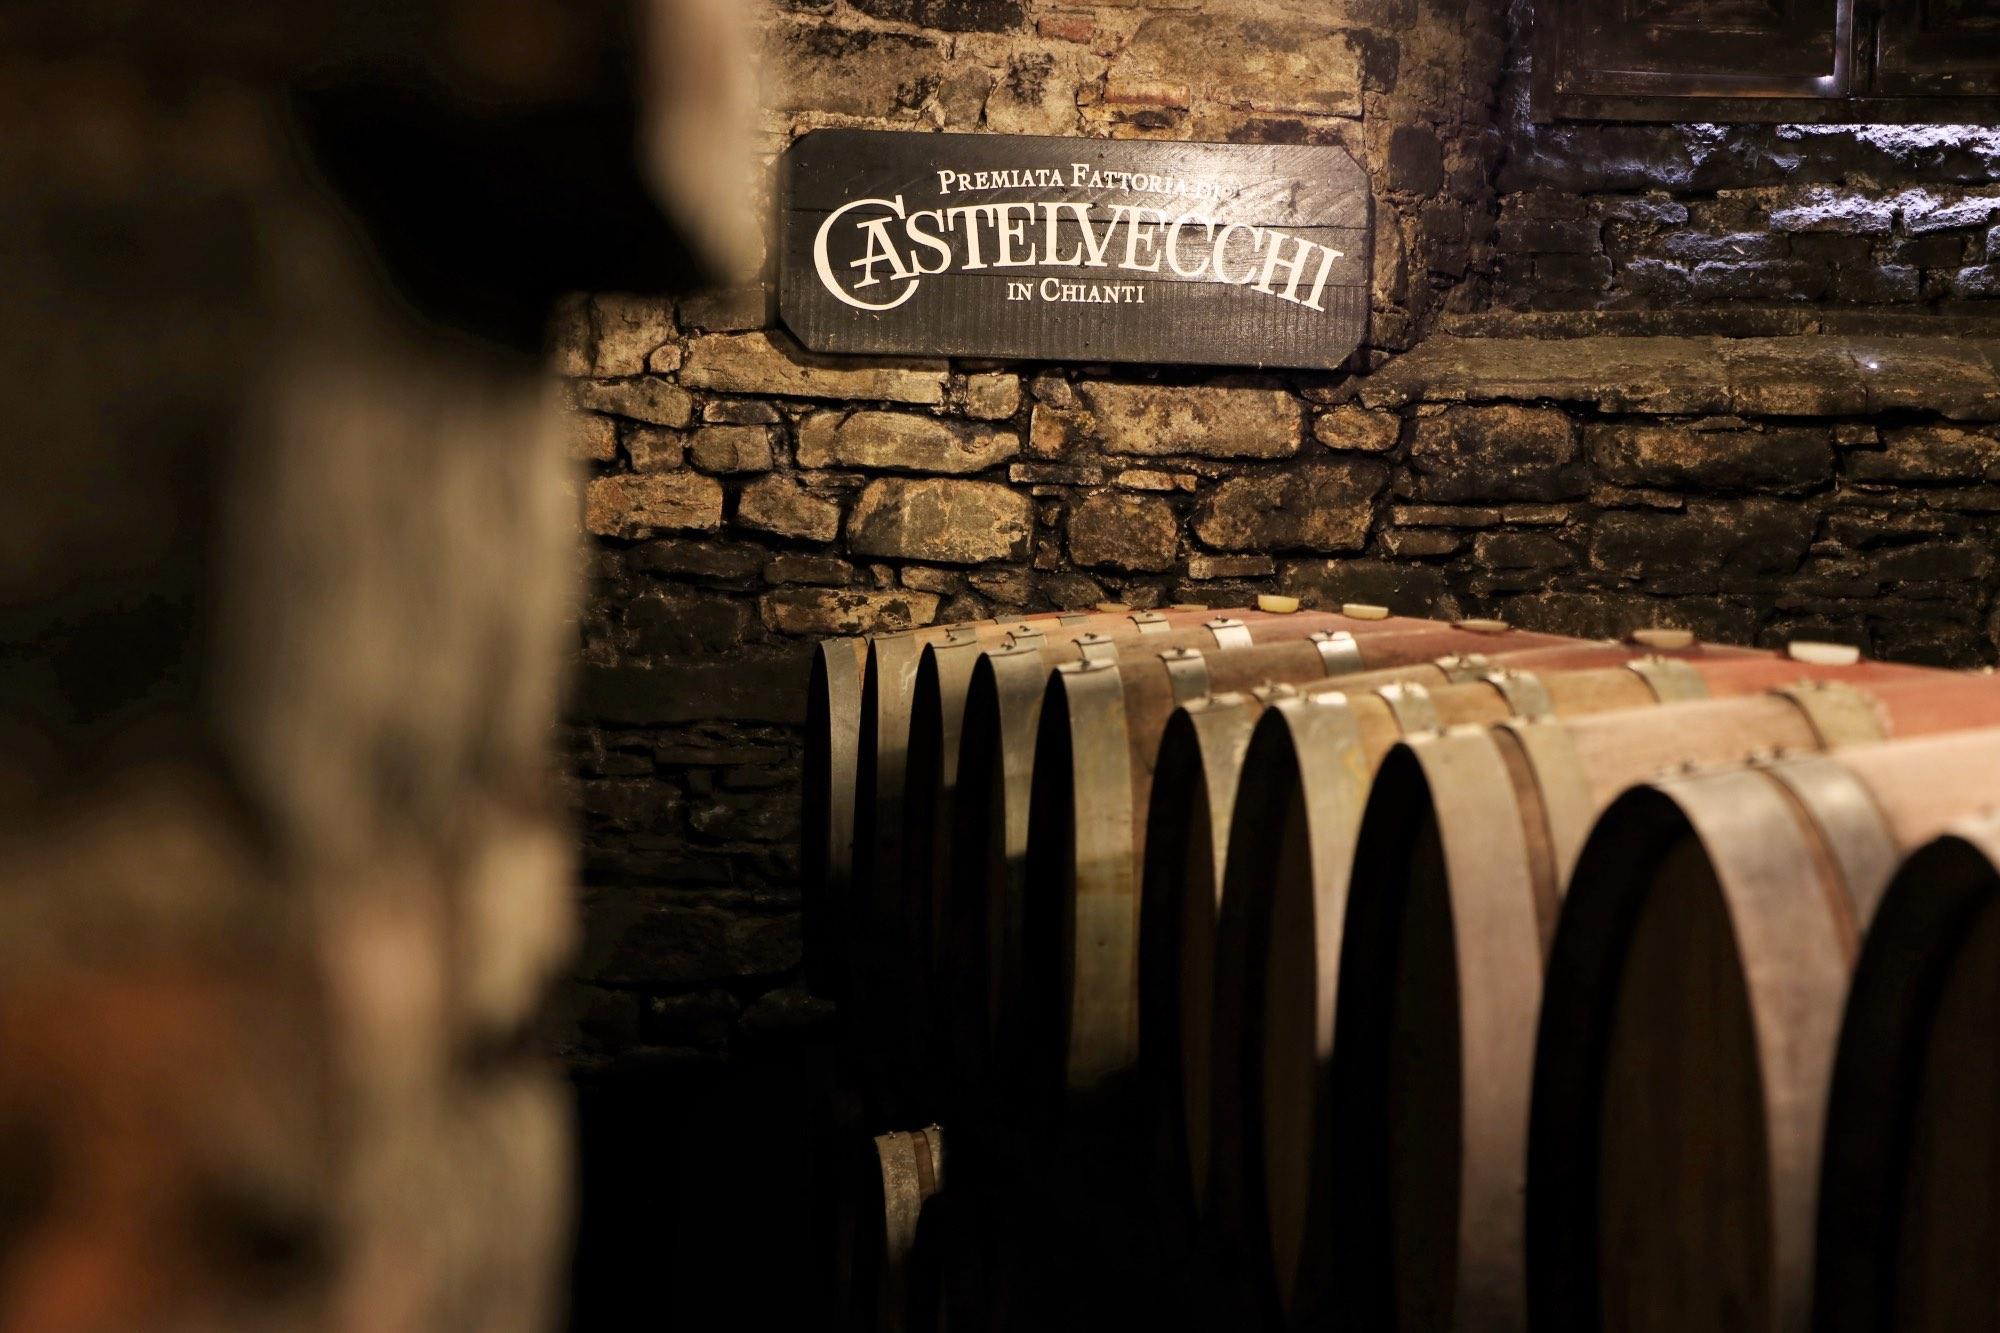 Weinkeller Castelvecchi Barrique